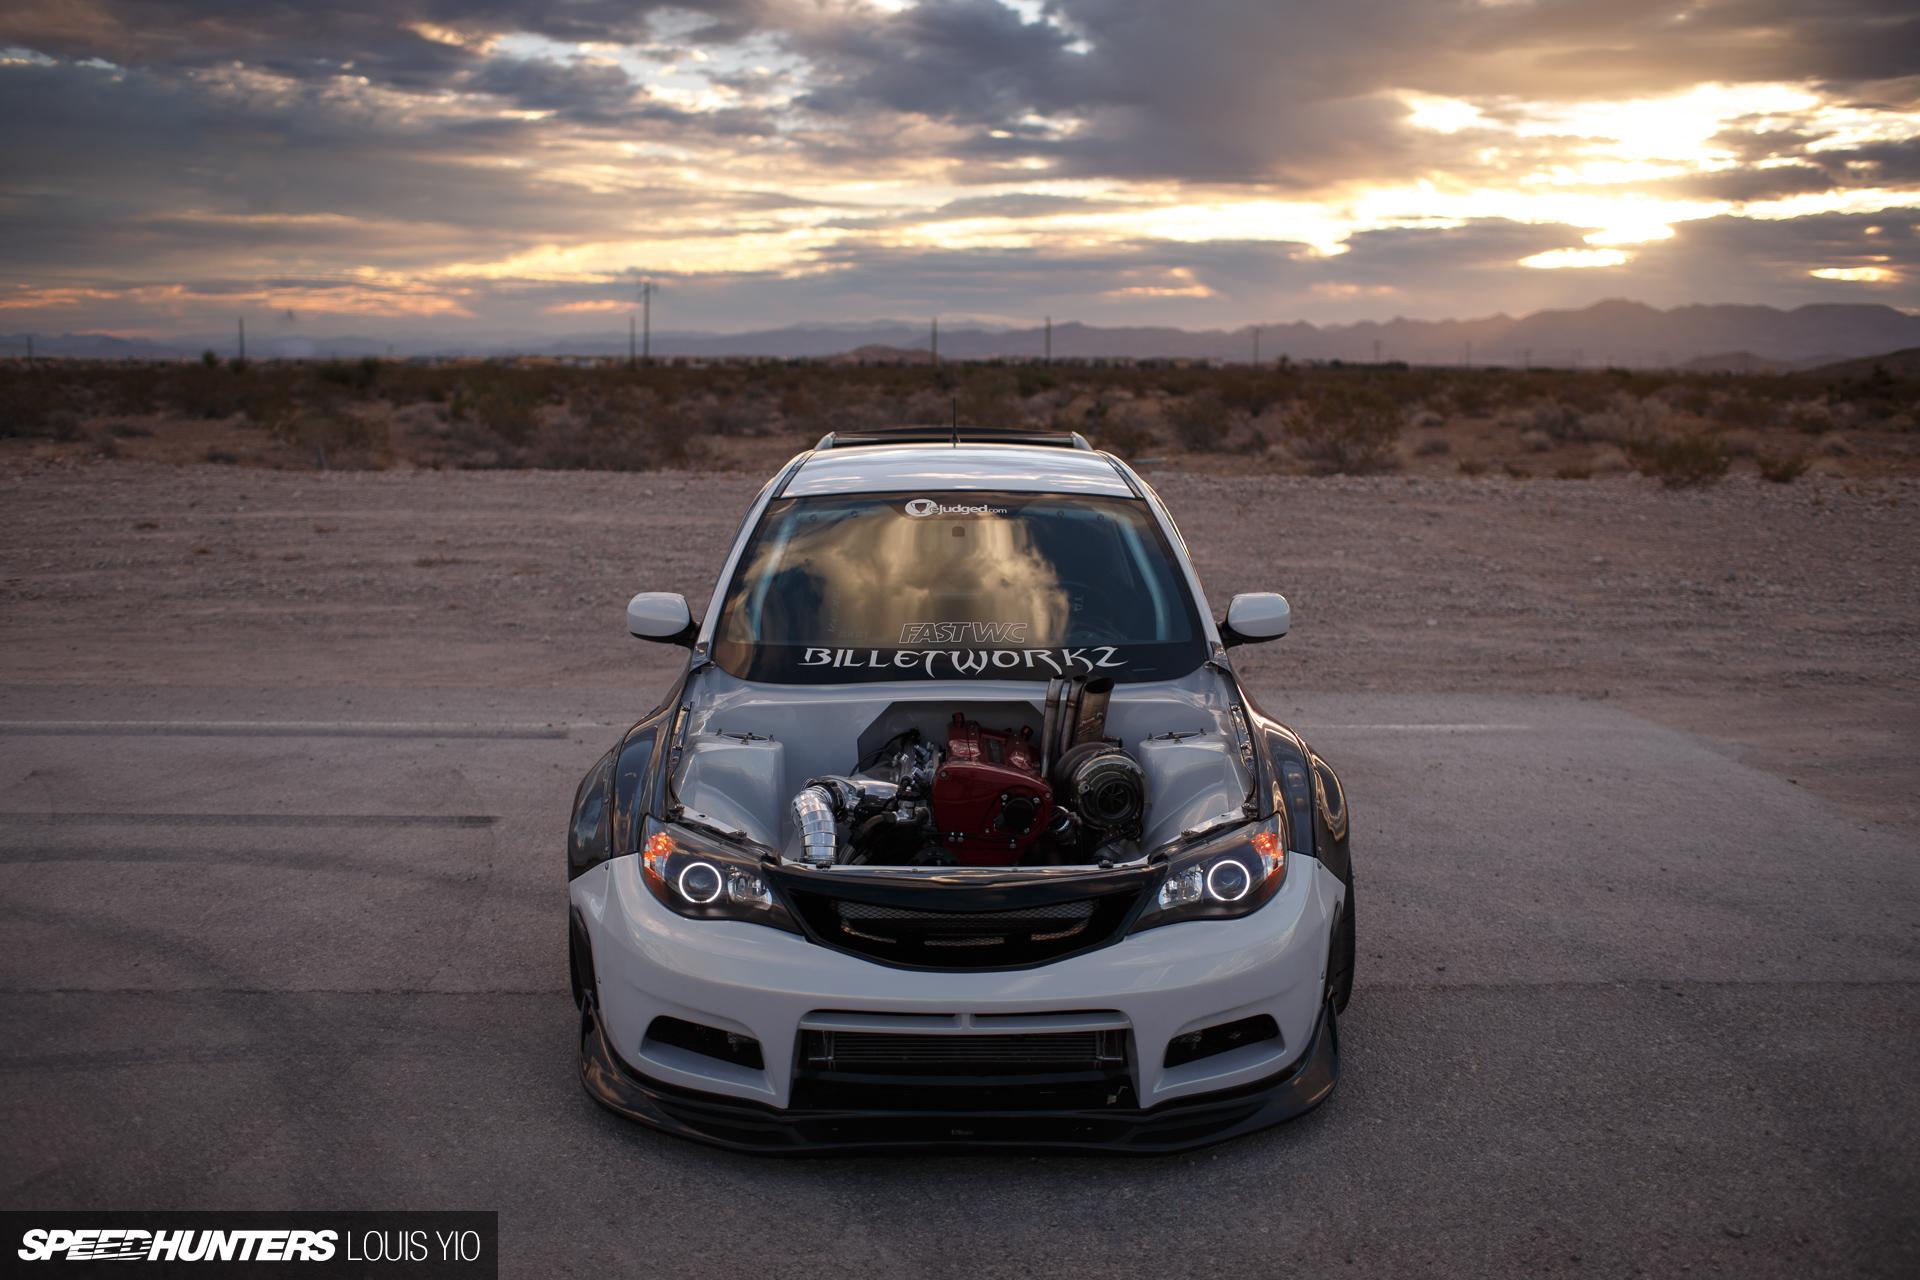 Louis_Yio_2017_Speedhunters_RB26_Subaru_27